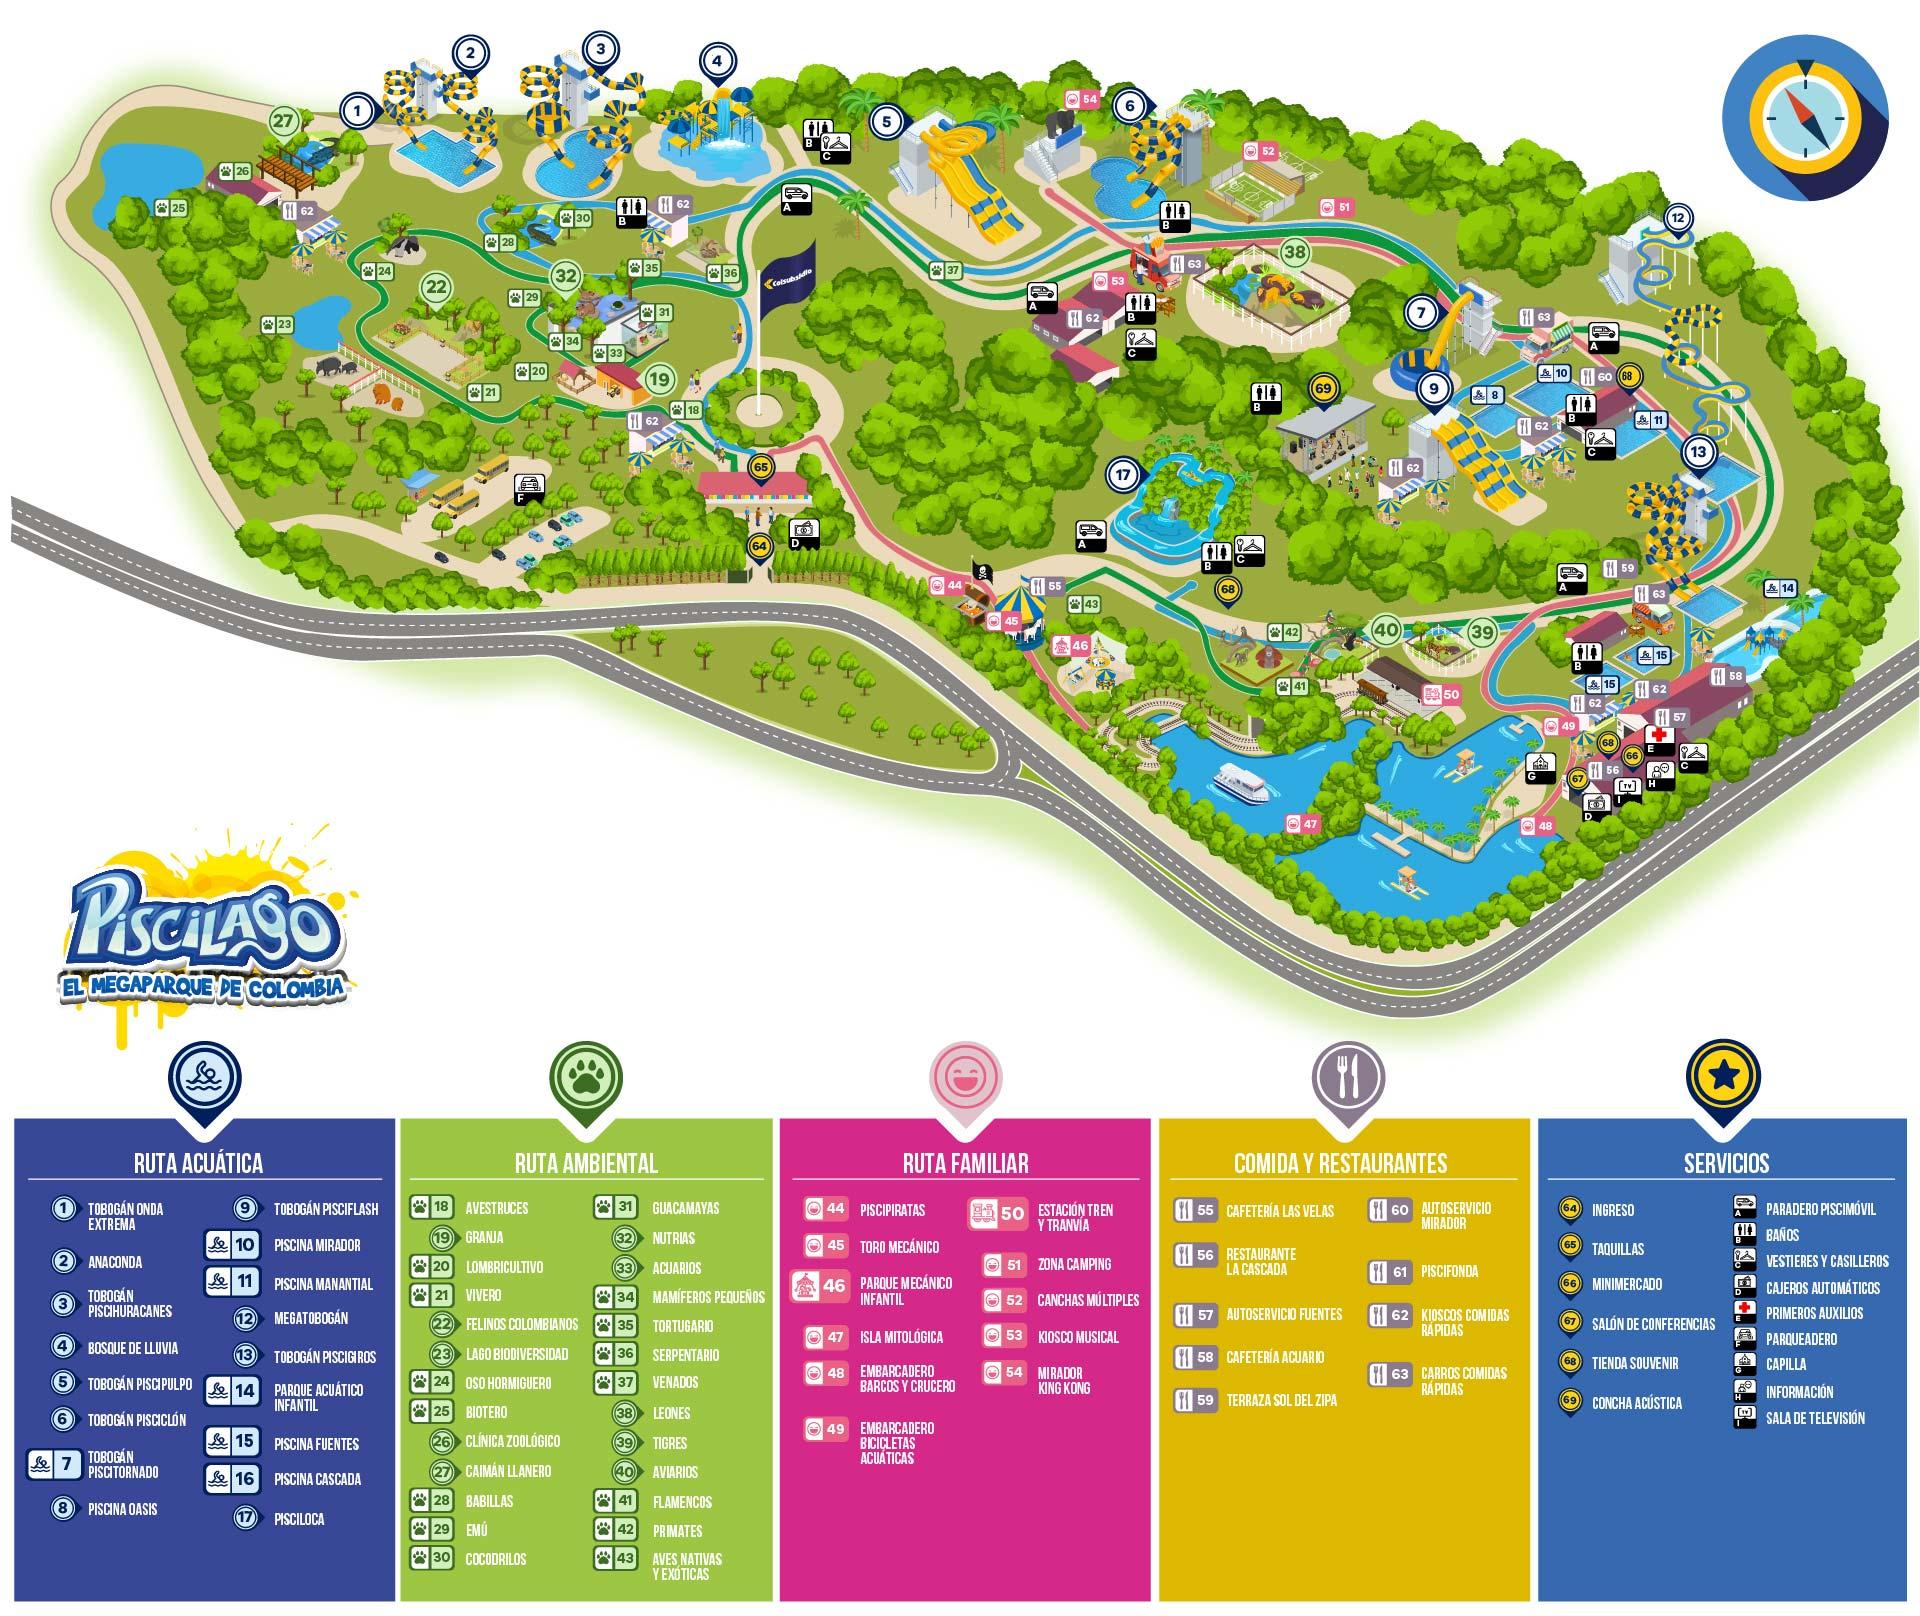 mapa-piscilago-colsubsidio-media